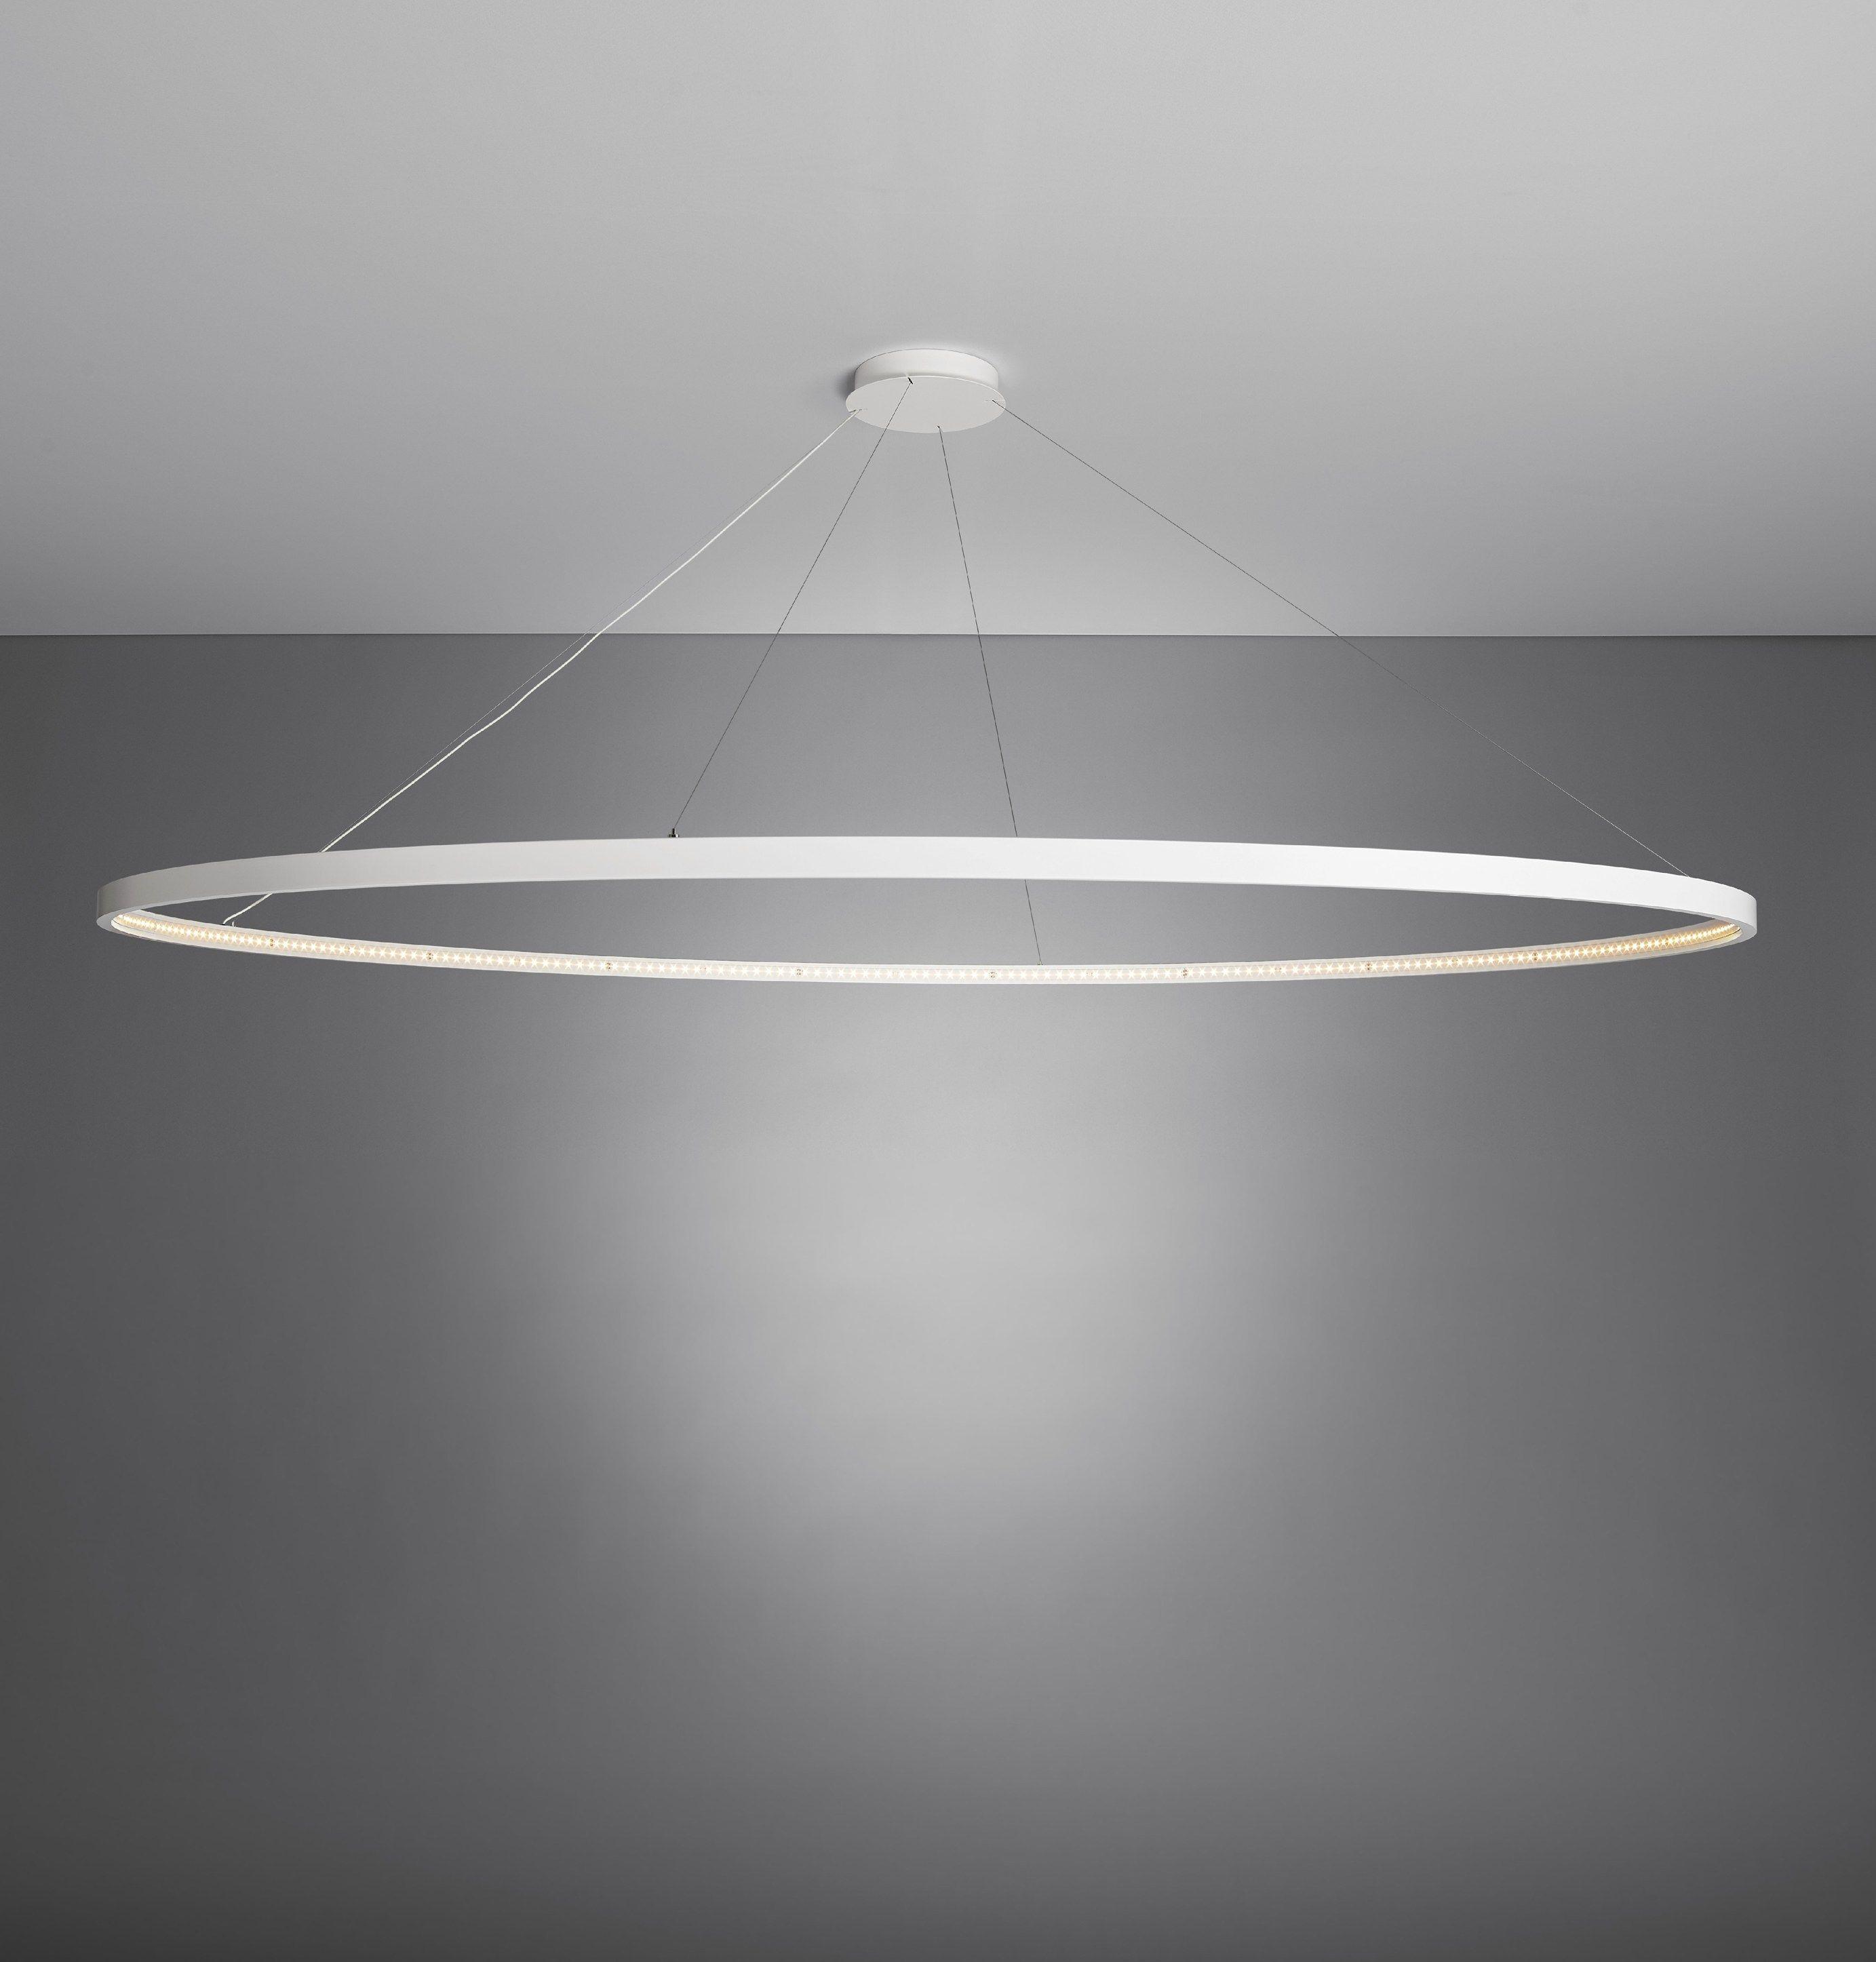 Lighting Direct: LED DIRECT-INDIRECT LIGHT STEEL PENDANT LAMP OMEGA 200 BY